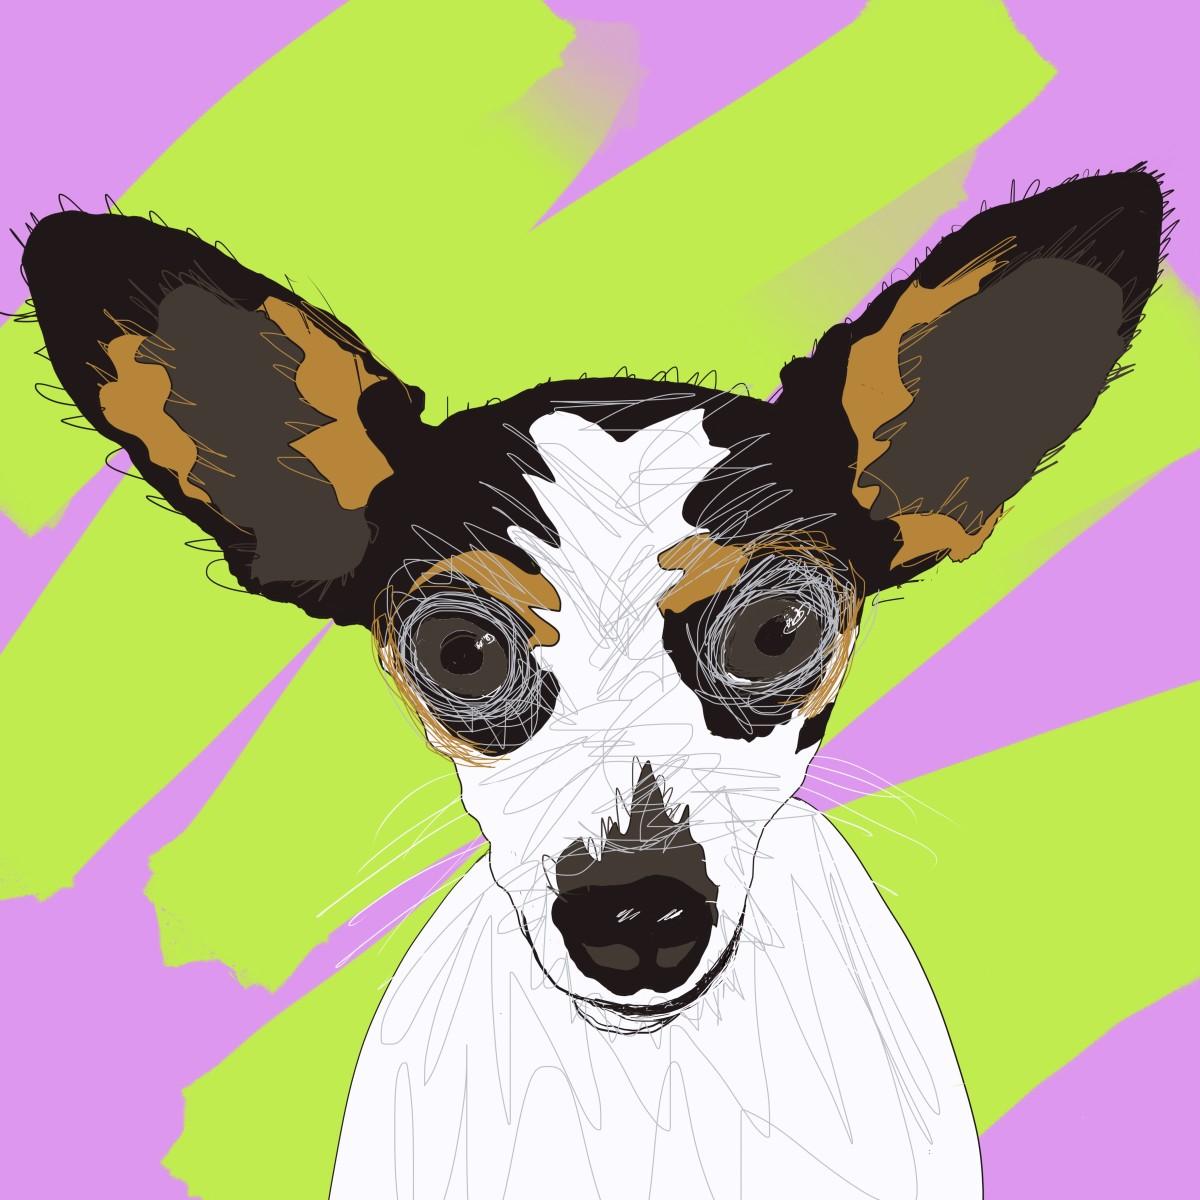 Pippi the Dog